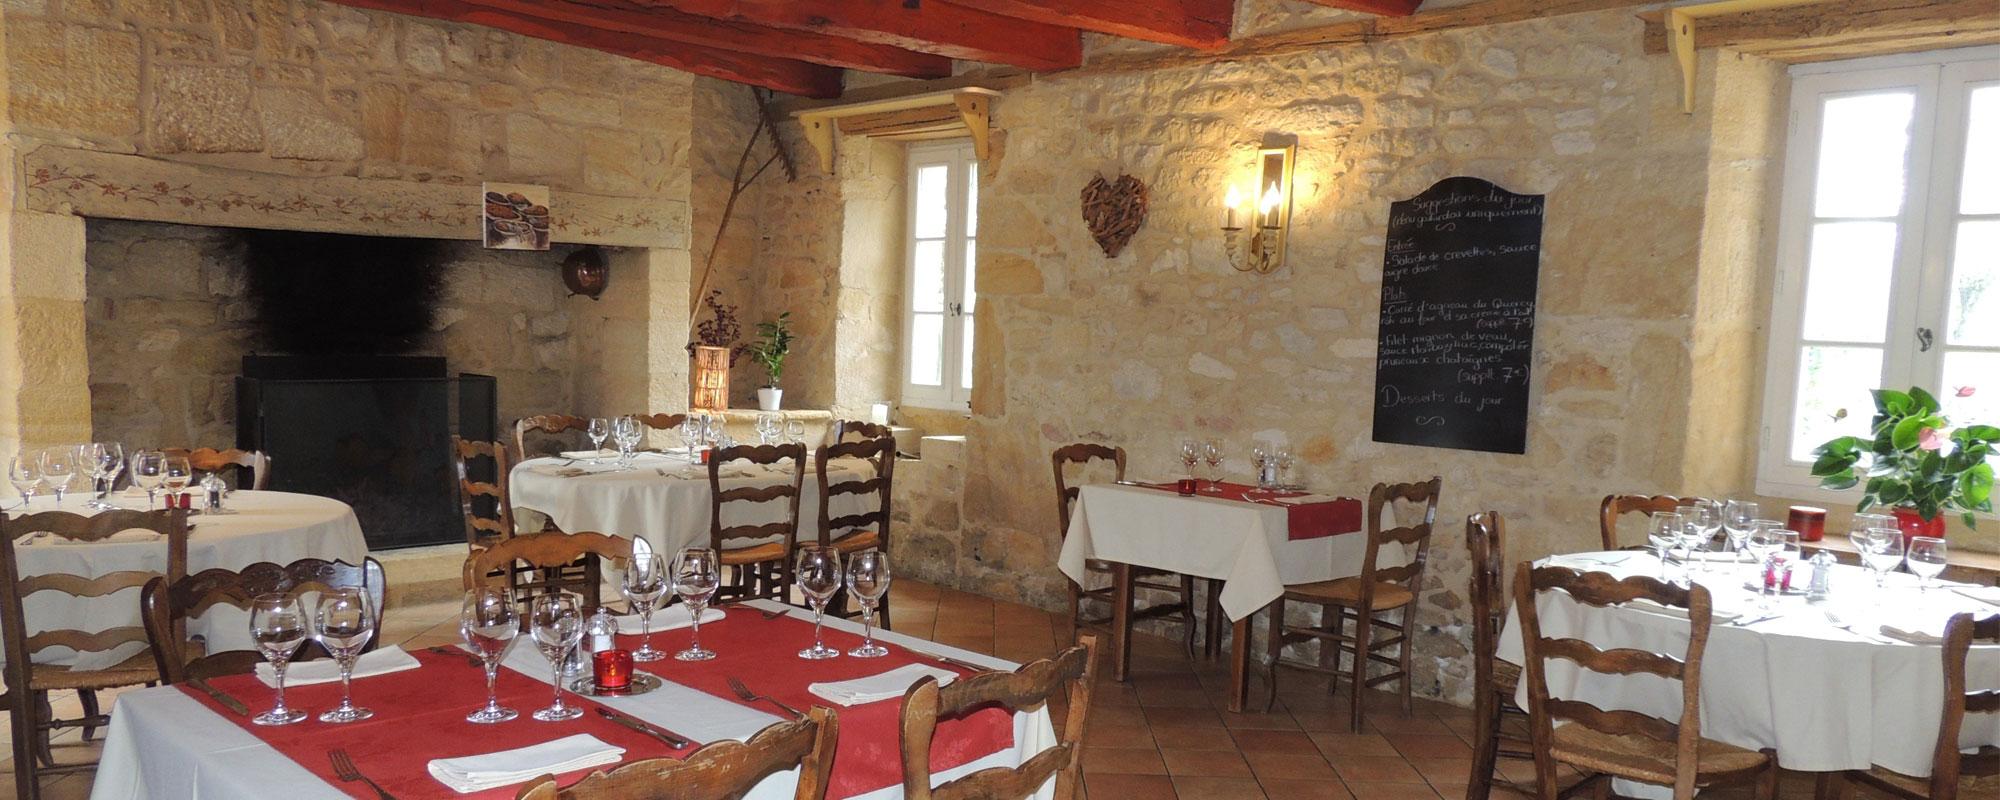 restaurant-prés-gaillardou-laroquegageac